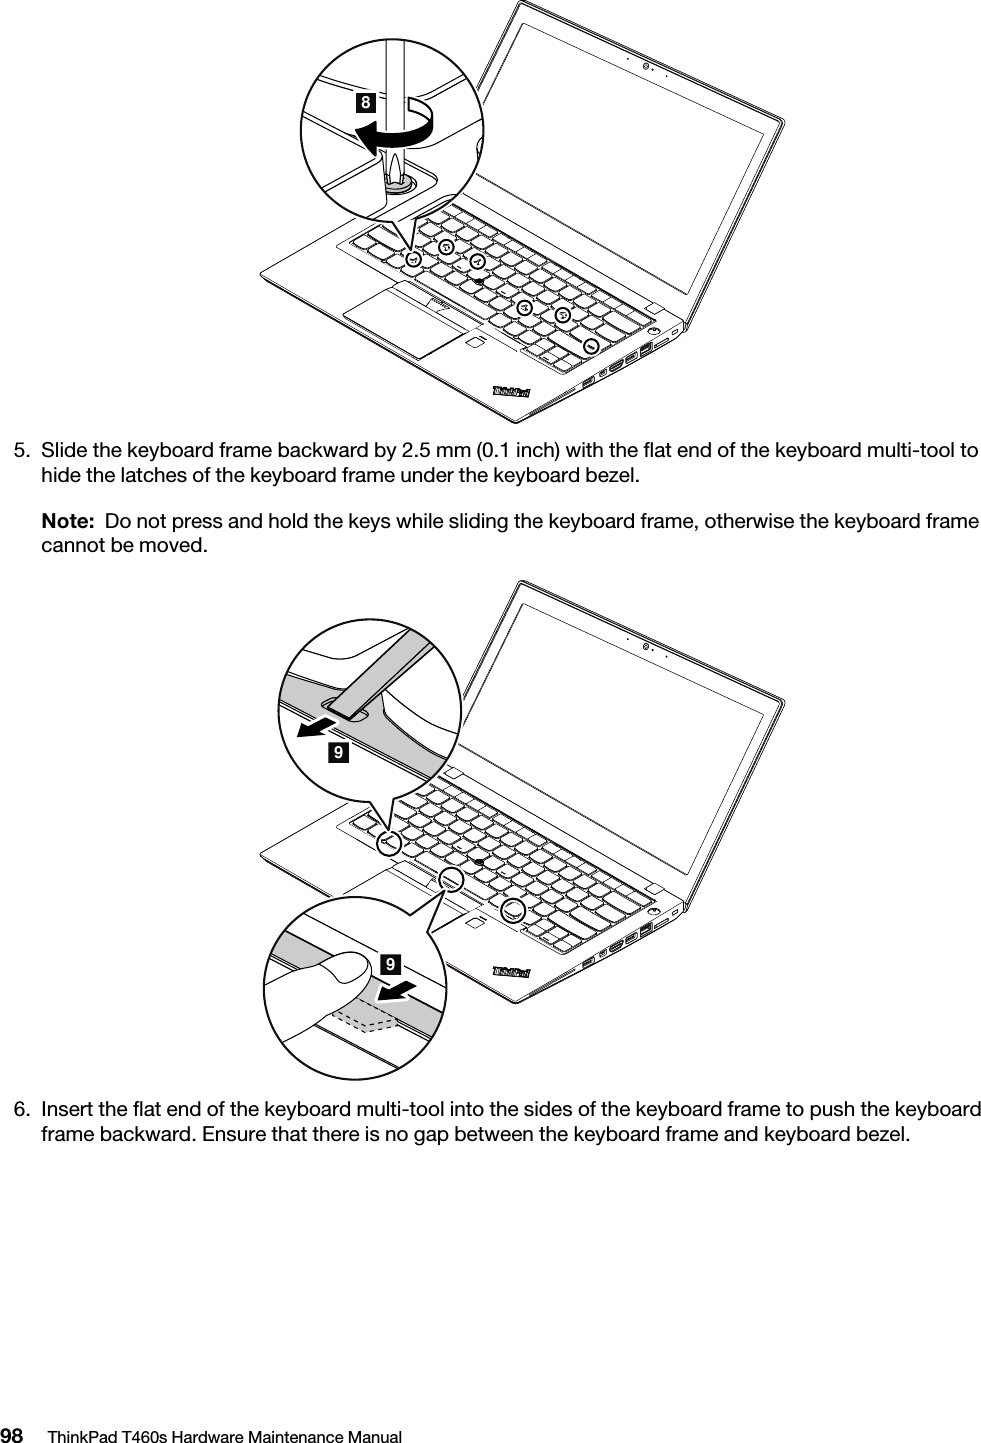 Lenovo T460S Hmm En Sp40K04862 03 ThinkPad Hardware